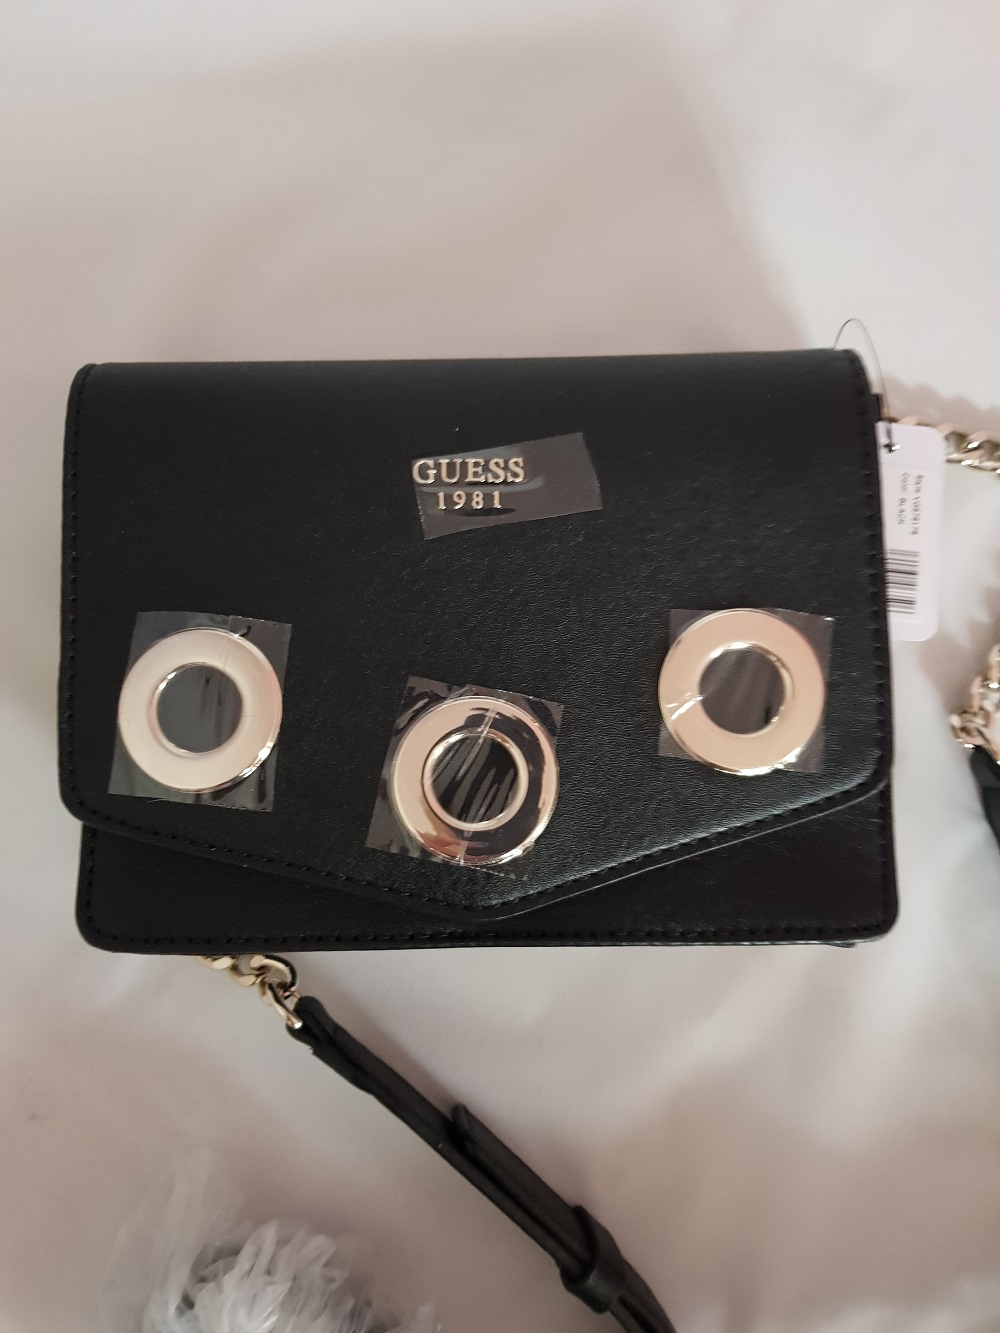 318e84048a873 GUESS torebka Listonoszka Dinah w kolorze czarnym 7128689773 ...